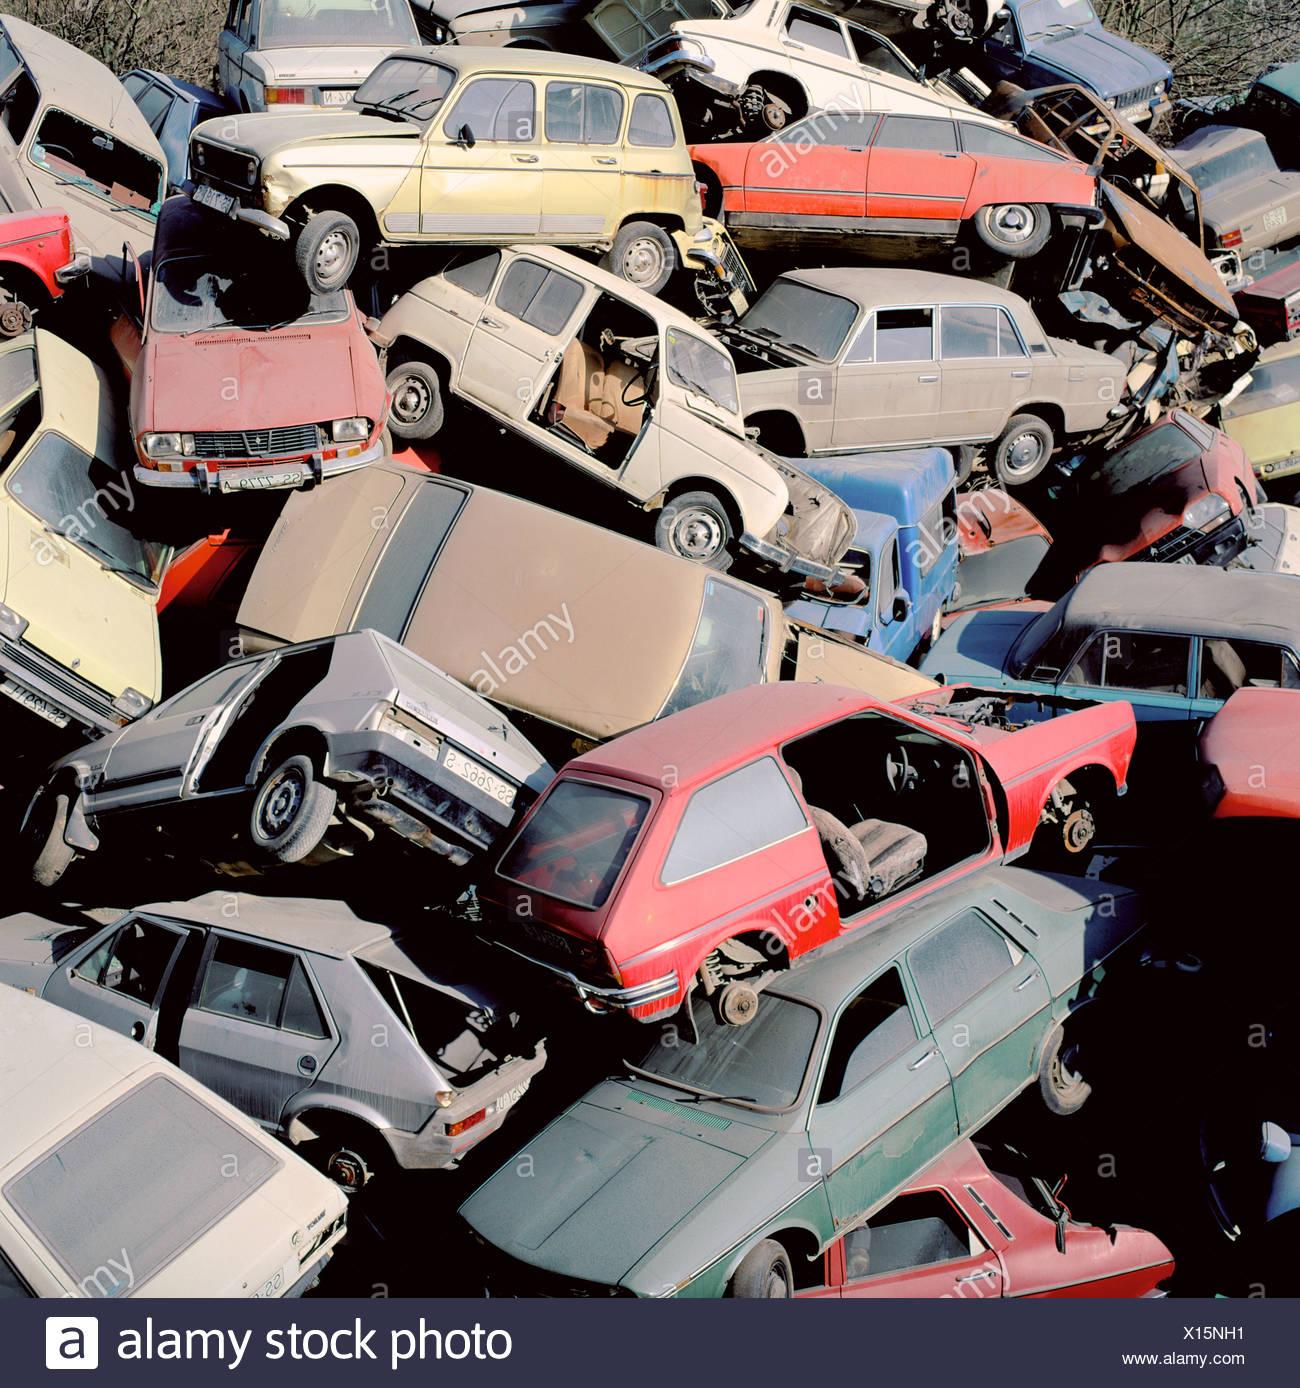 Scrapyard. Cestona. Spain - Stock Image